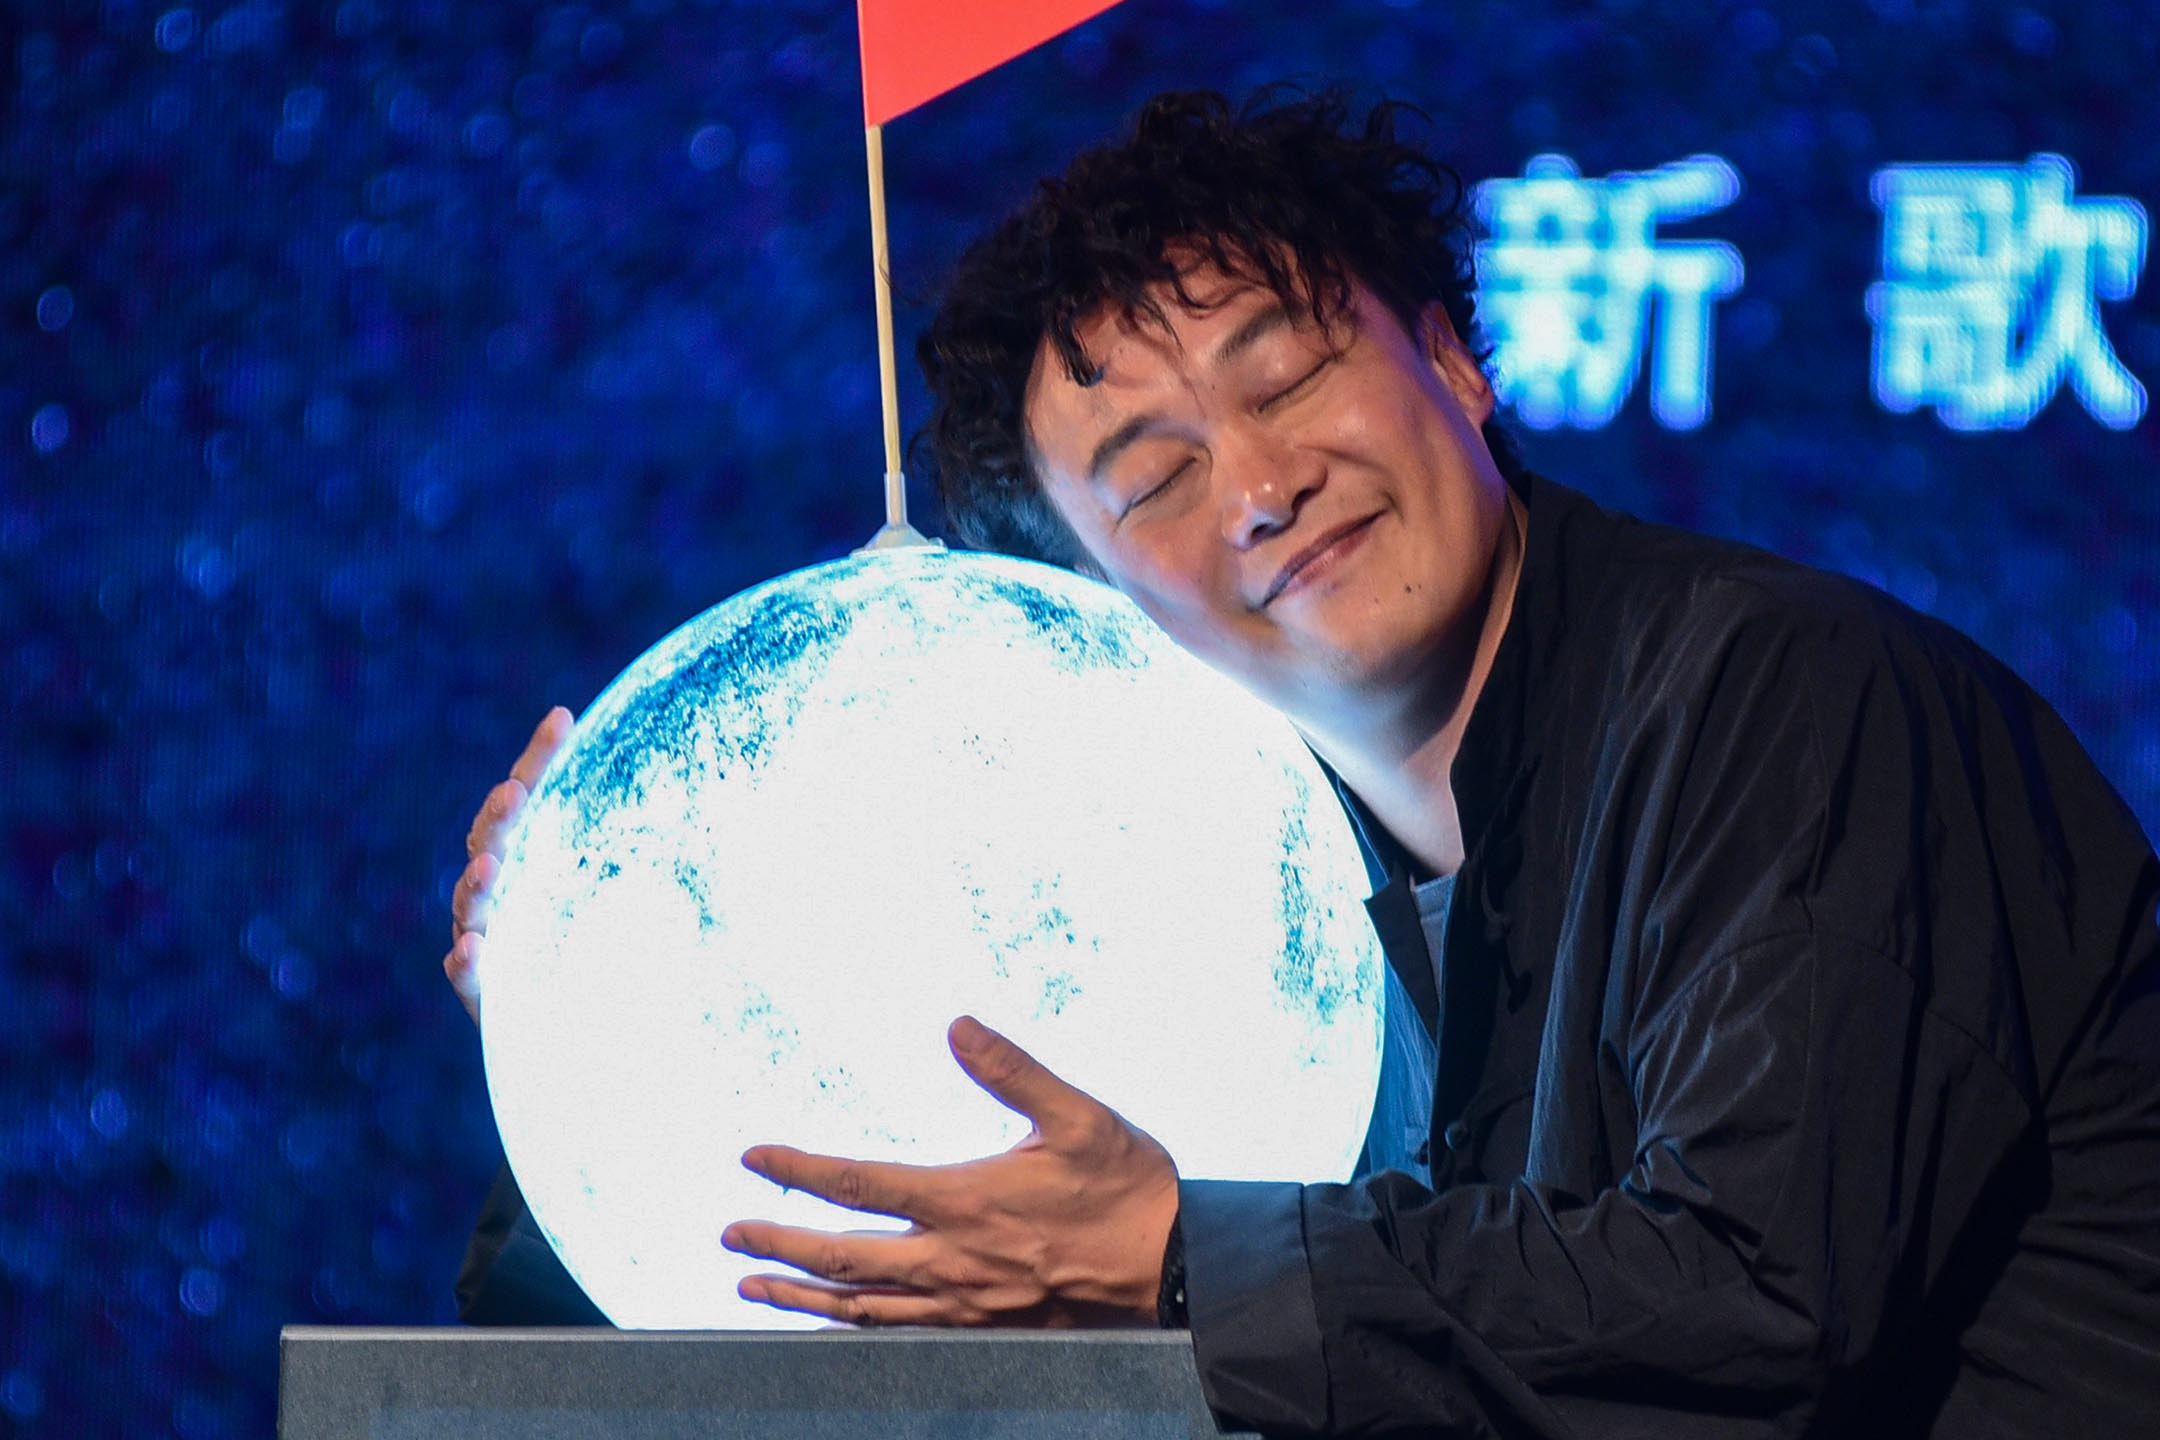 2017年8月23日台北,歌手陳奕迅推銷他的新專輯。 圖:Visual China Group via Getty Images